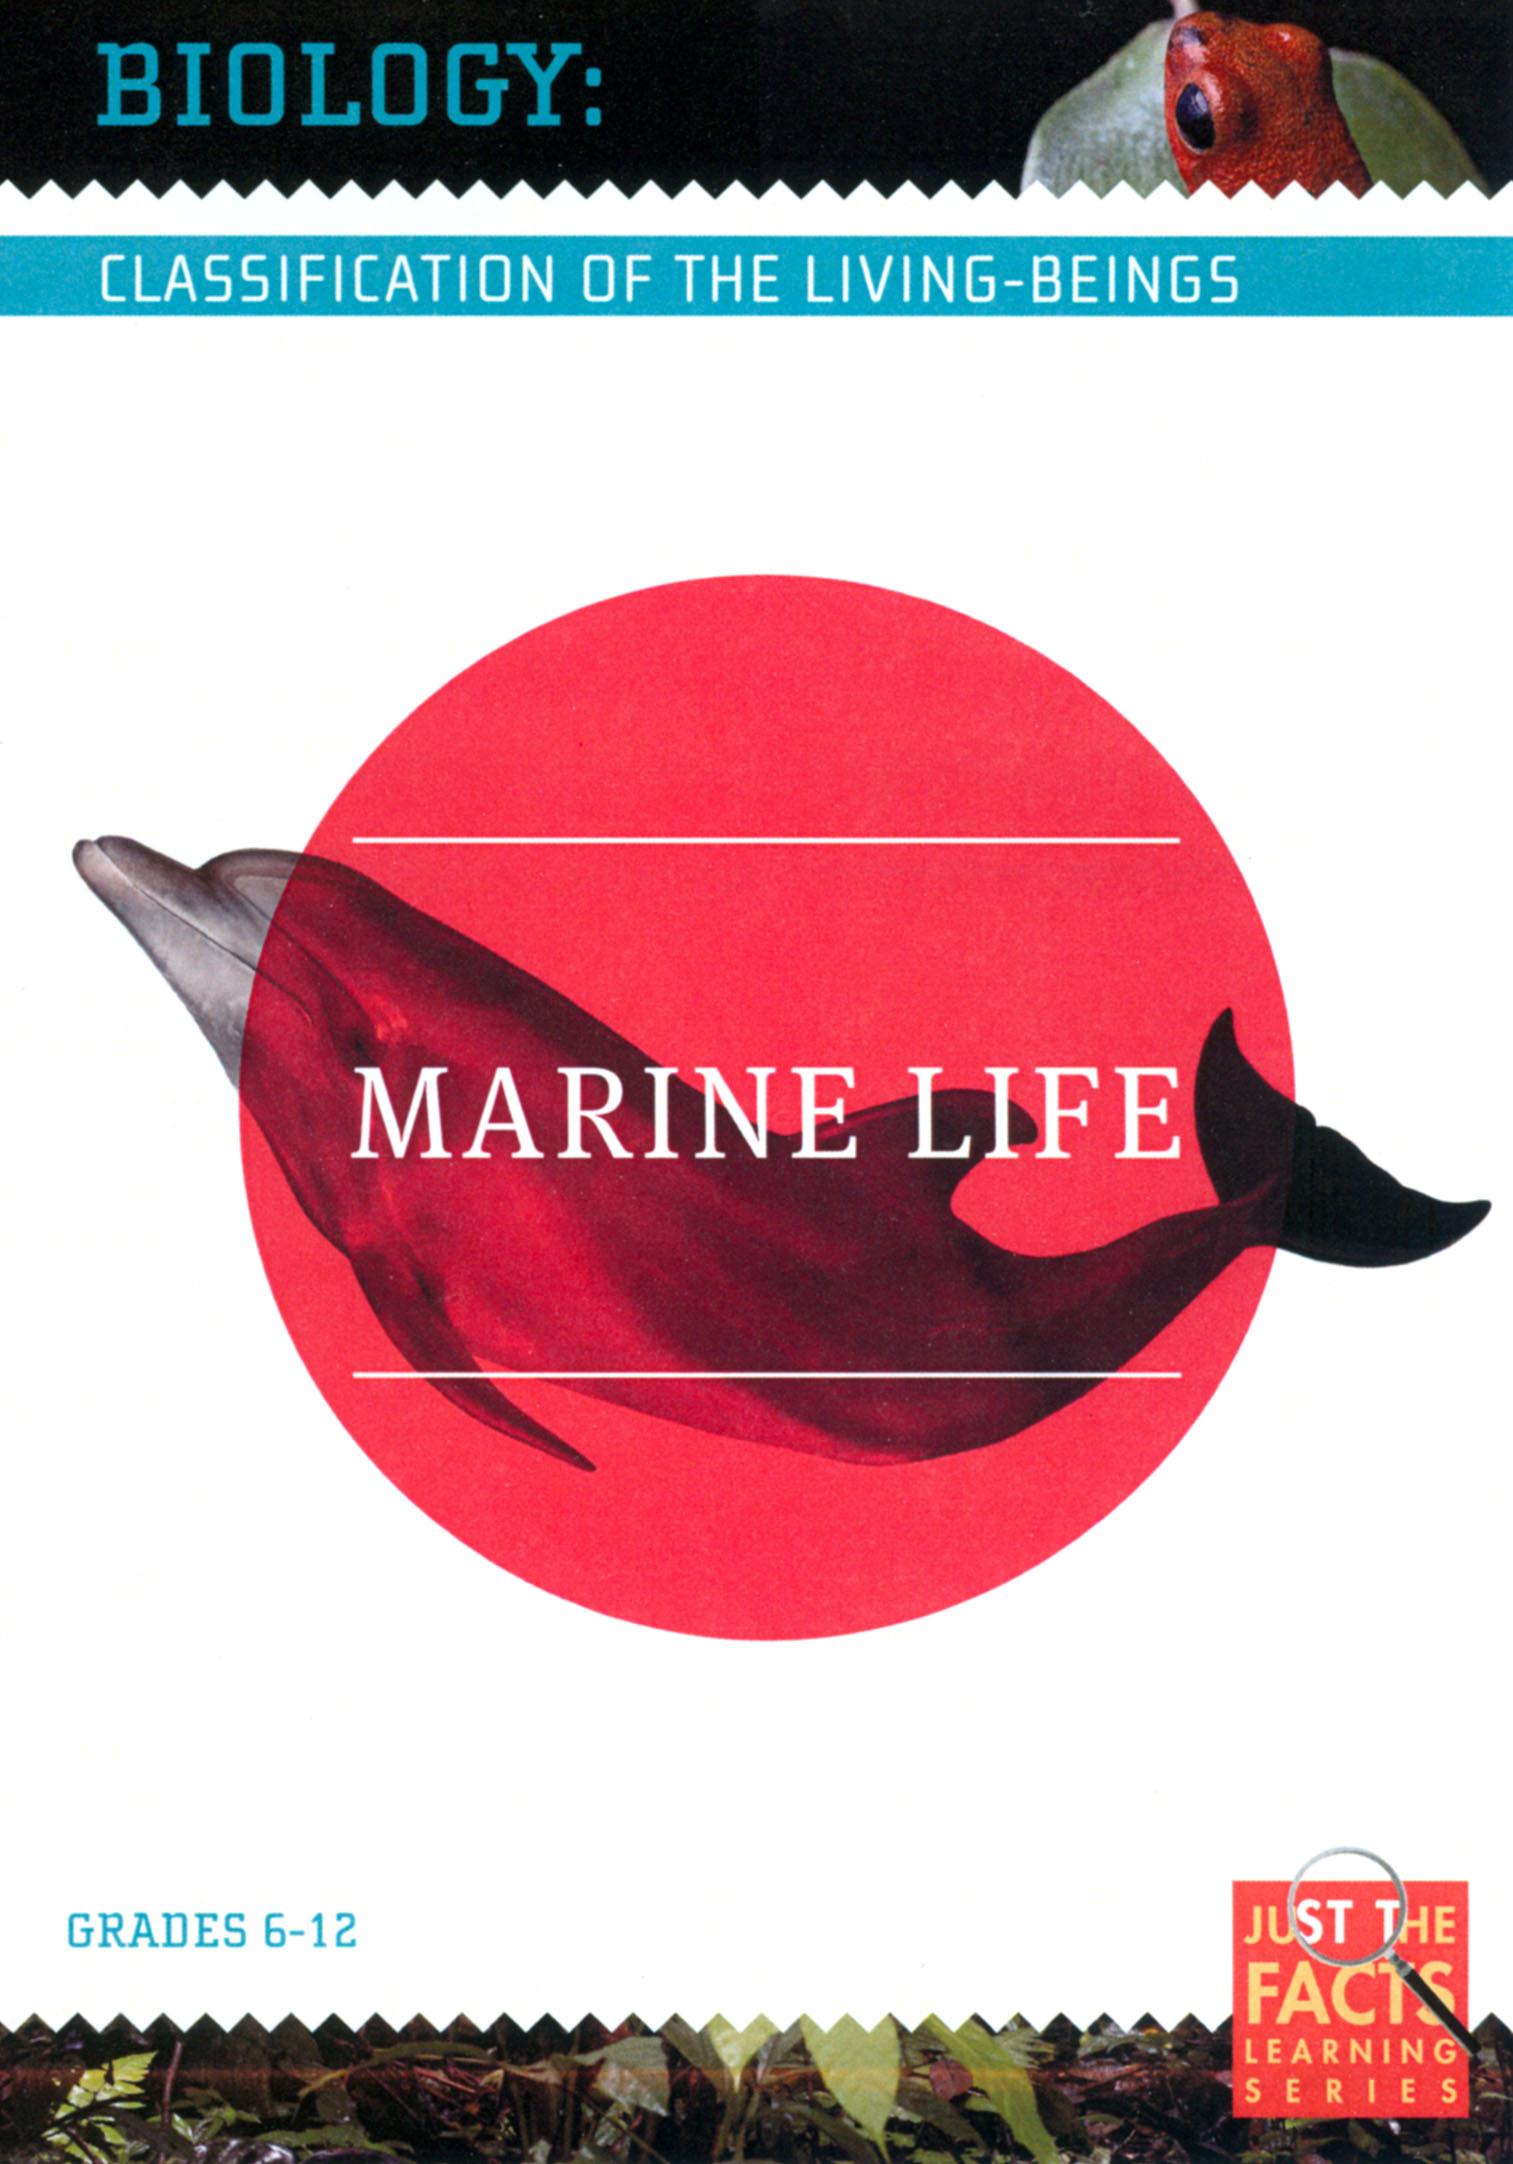 Biology Classification: Marine Life